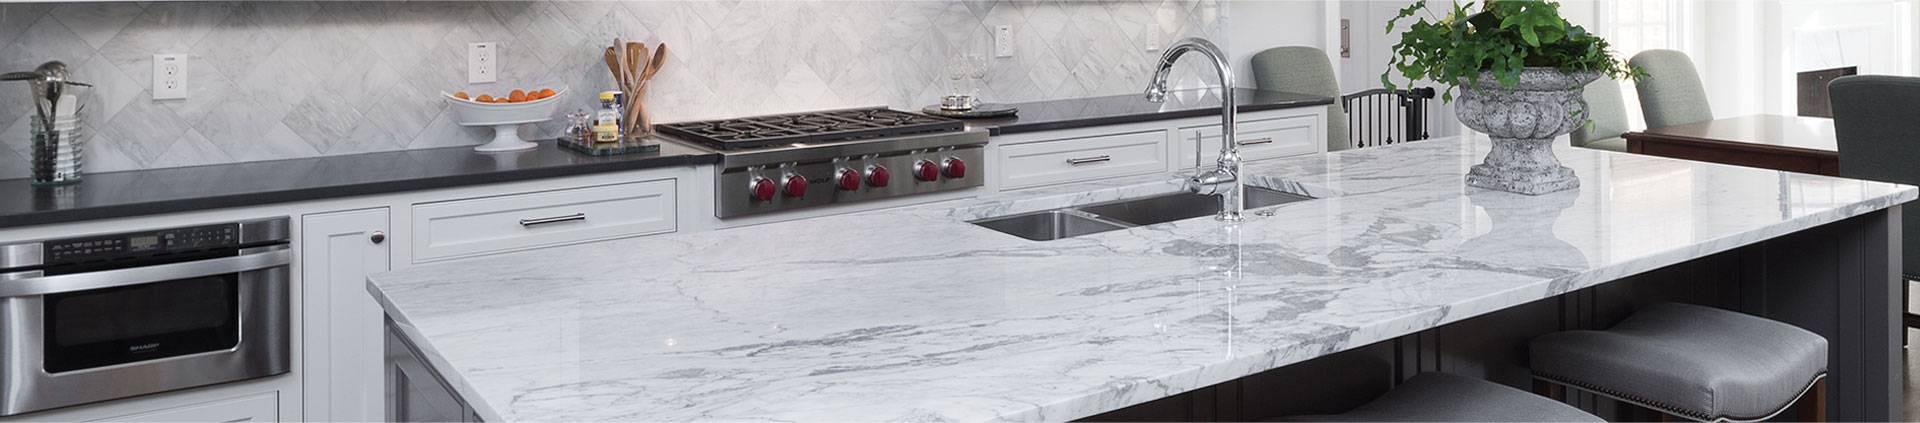 Contemporary Urban Design White Countertops With Veins